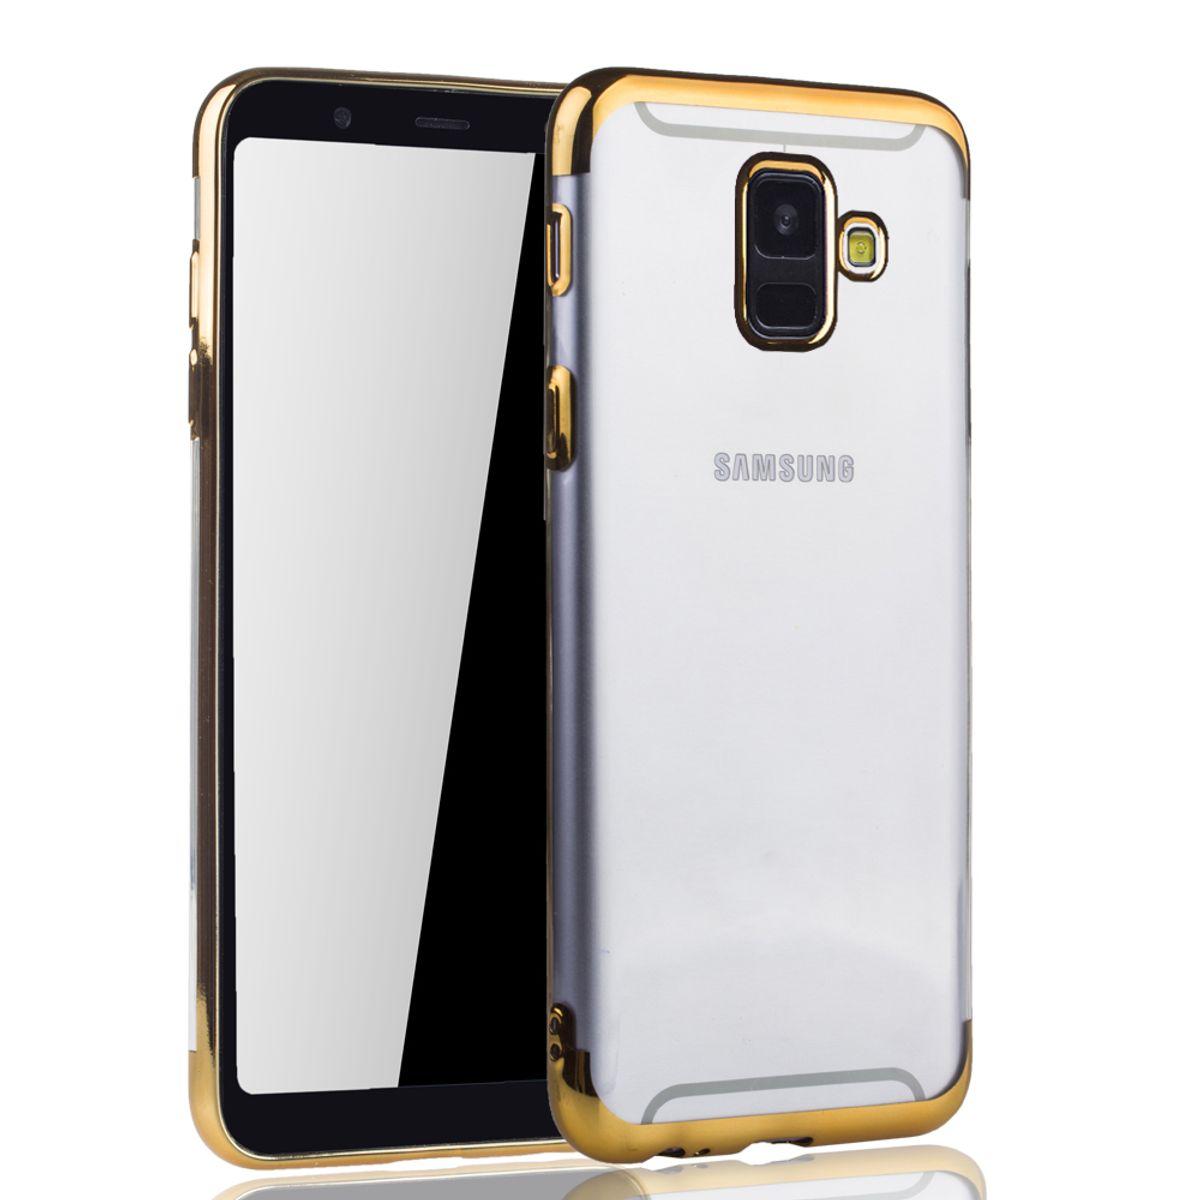 Handyhülle Samsung Galaxy : handyh lle f r samsung galaxy a6 2018 gold clear tpu silikon case backcover schutzh lle in ~ Aude.kayakingforconservation.com Haus und Dekorationen